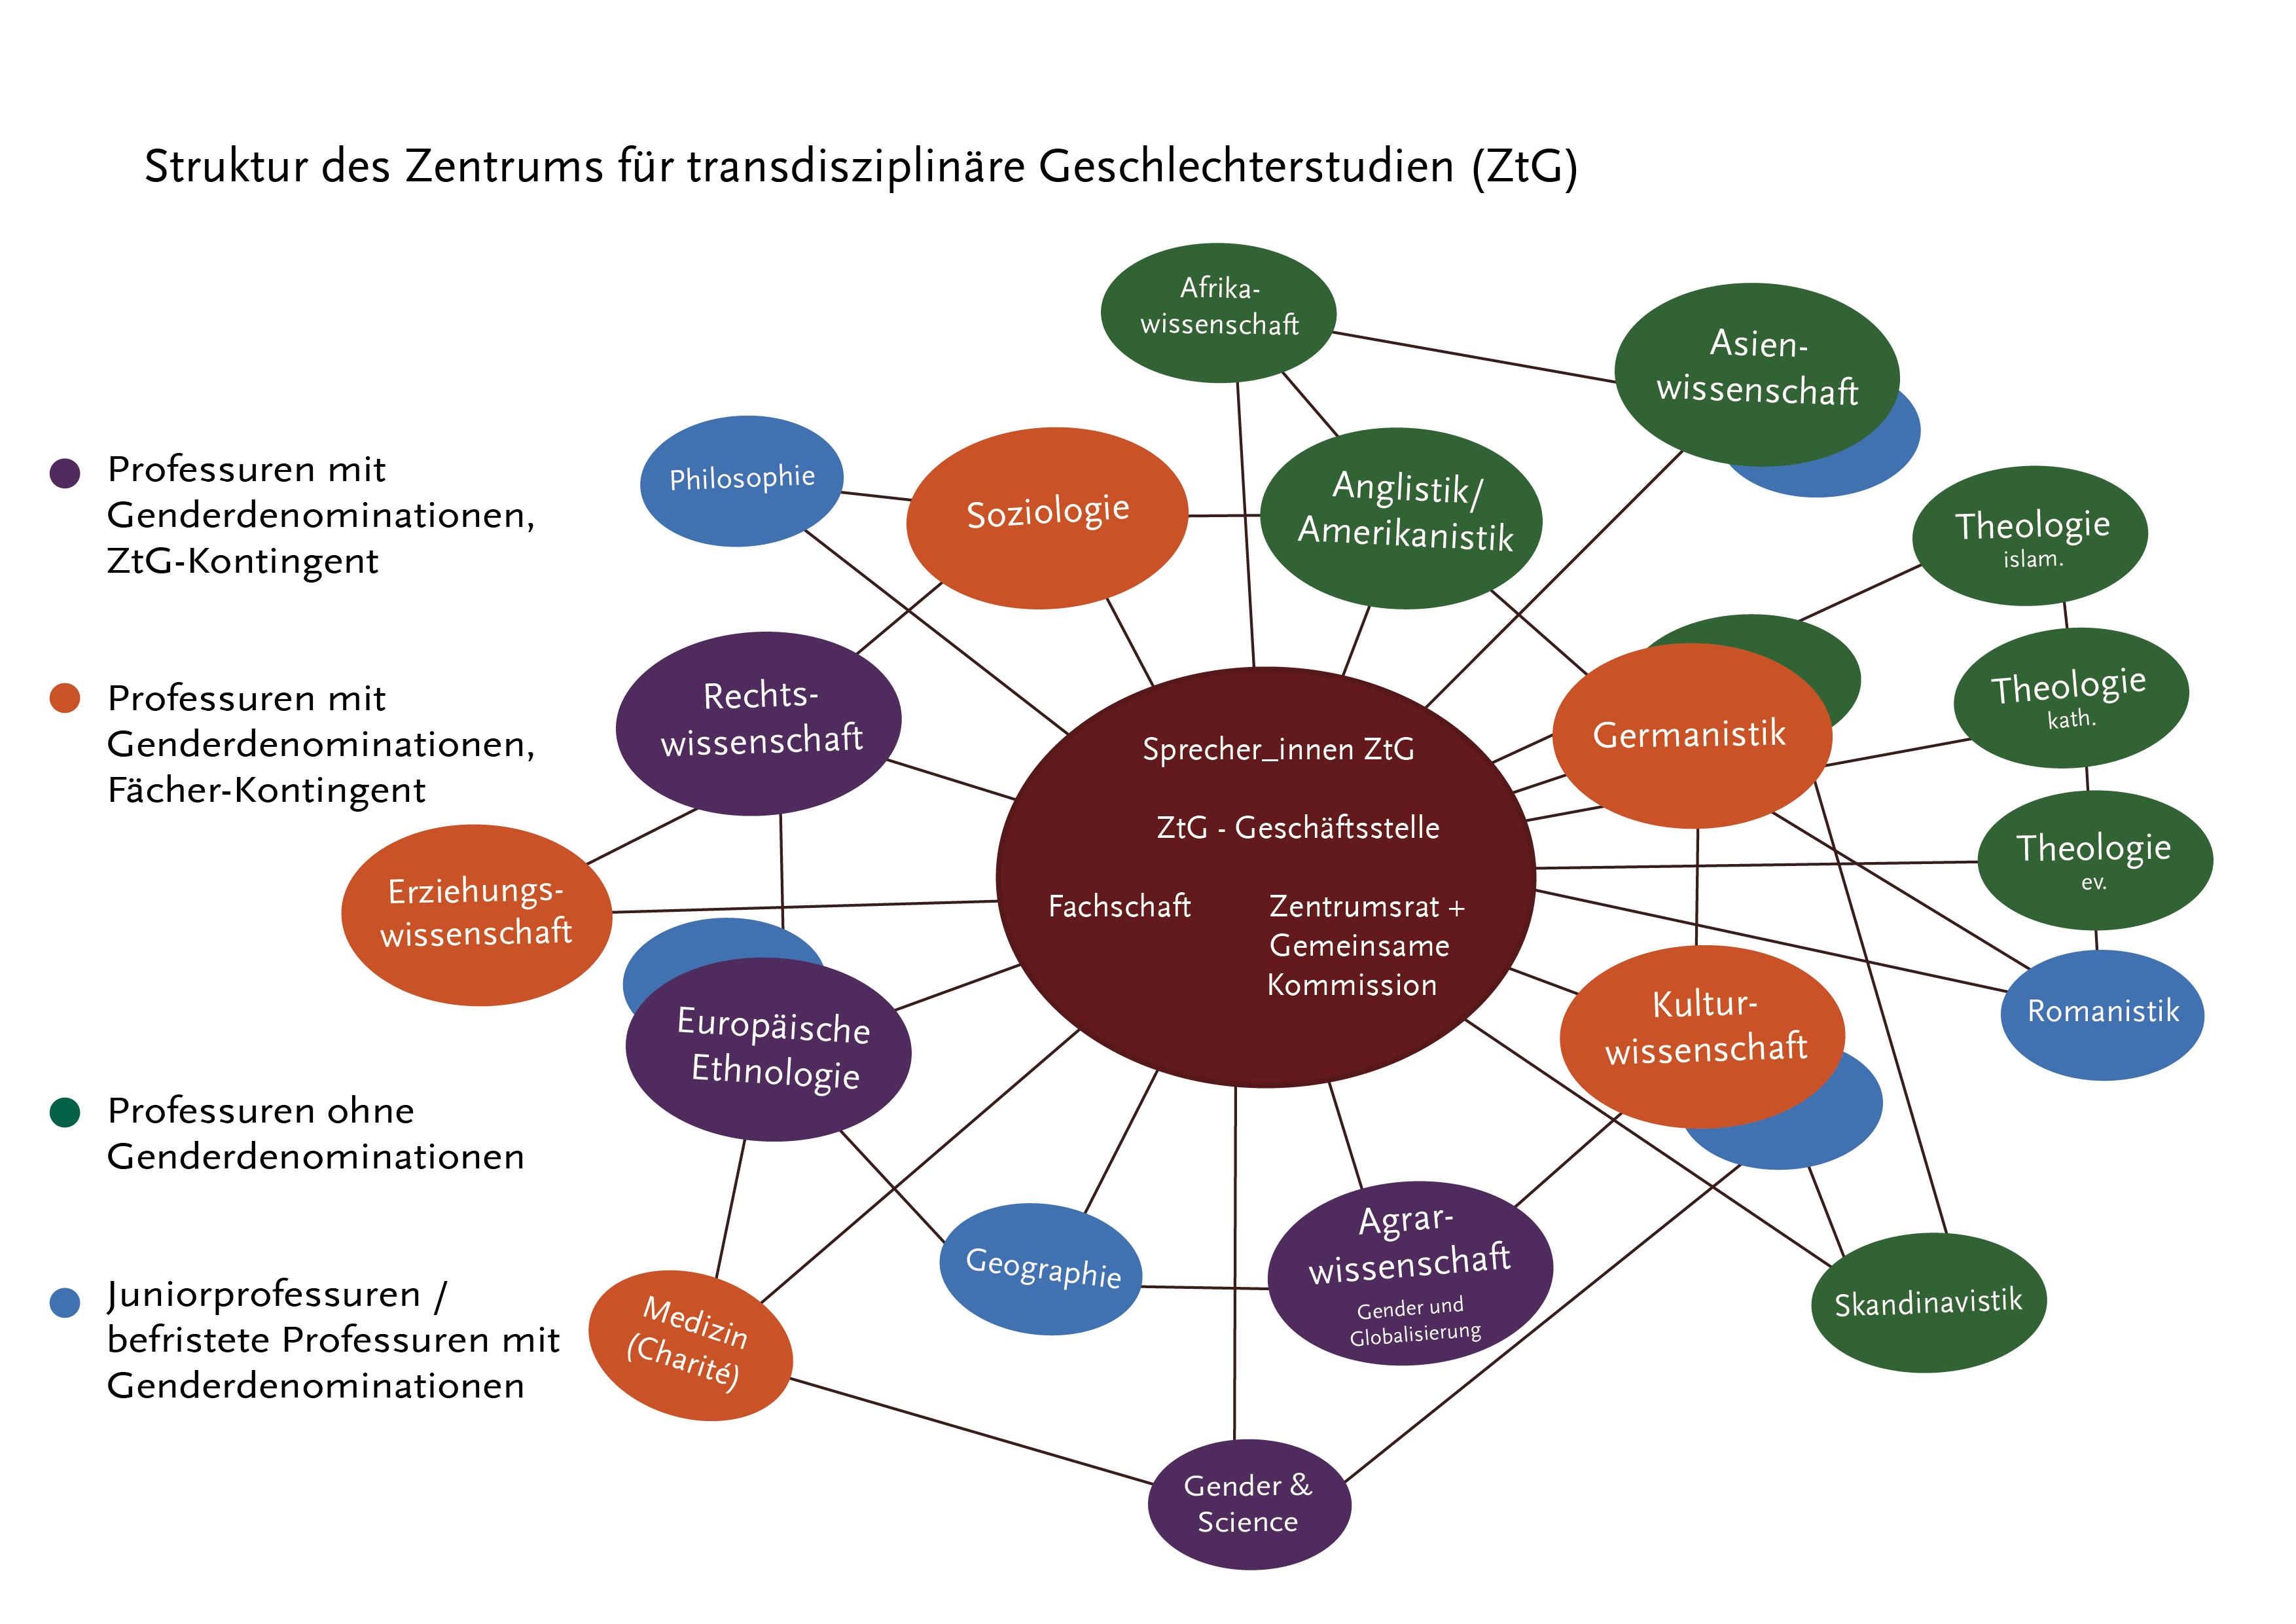 Zentrum für transdisziplinäre Geschlechterstudien Struktur Oktober 2021